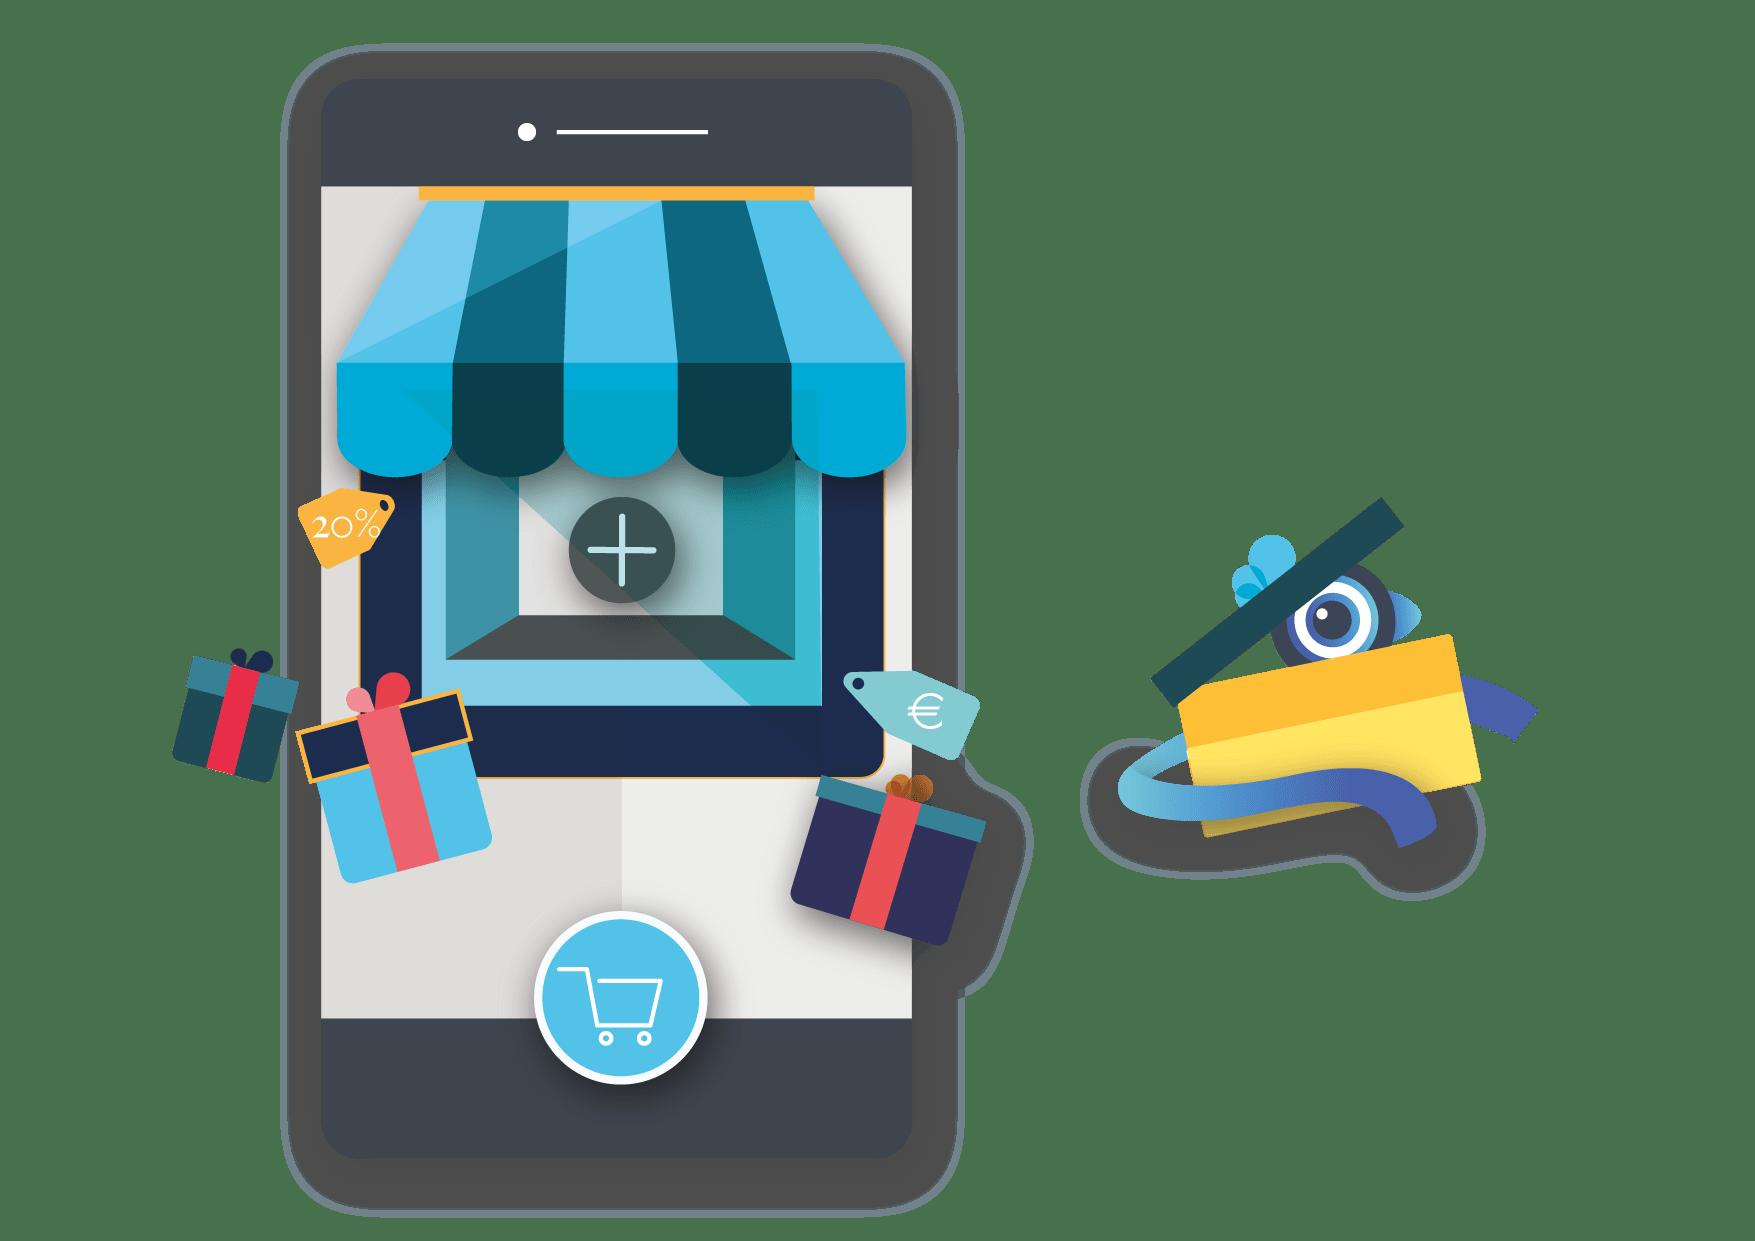 E-commerce - Generate Revenue through our digital marketing service